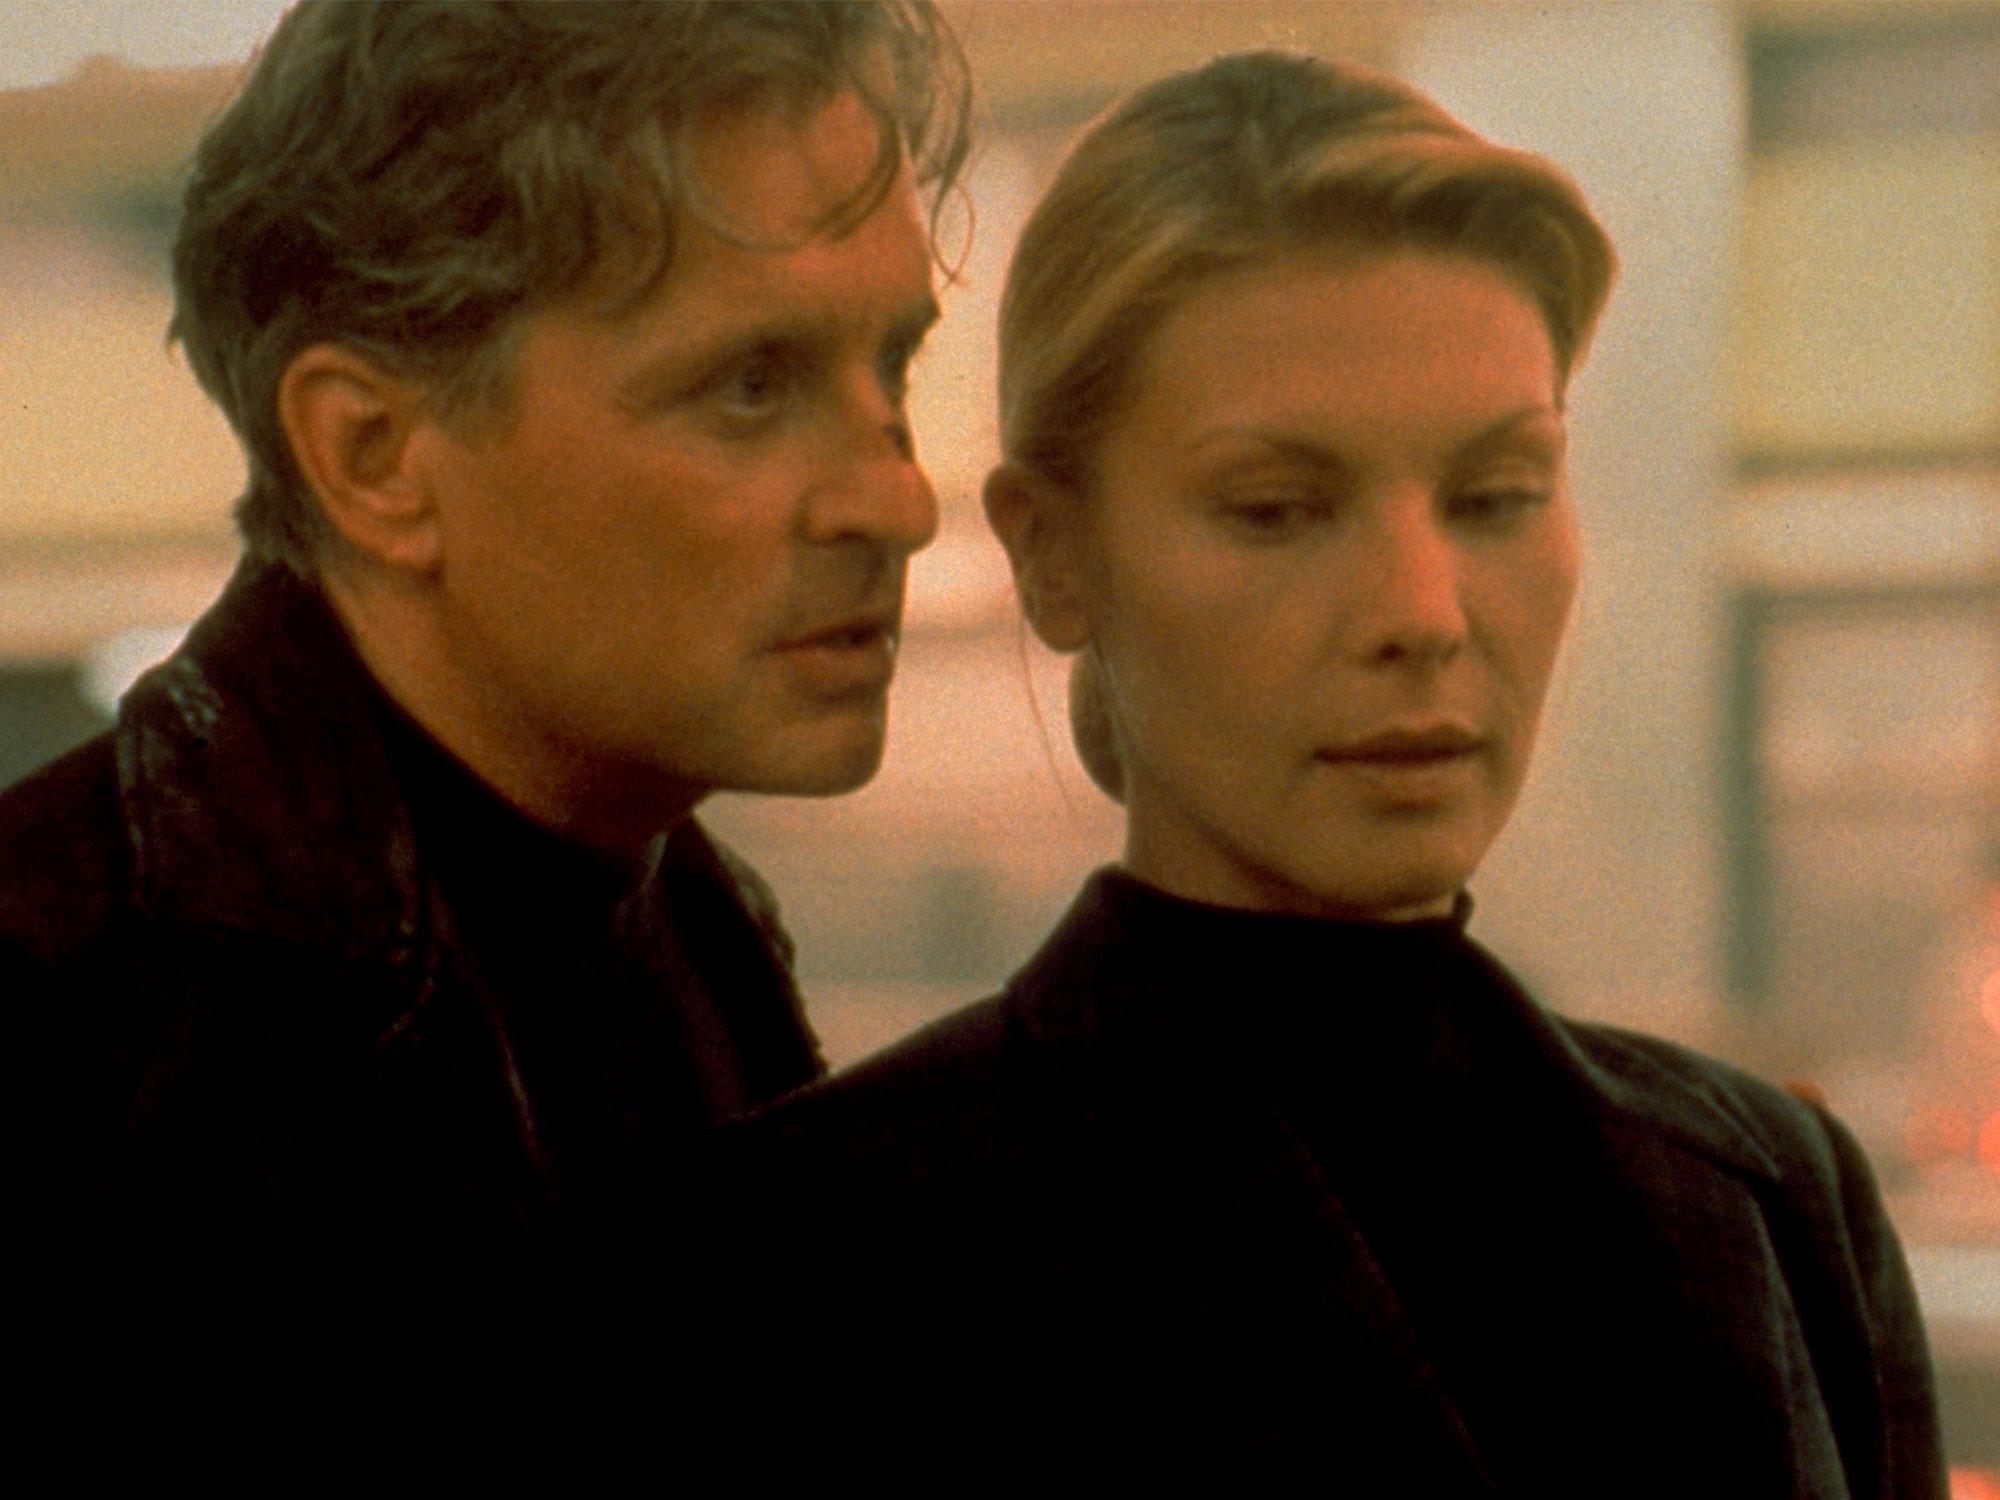 Michael Douglas and Deborah Kara Unger in The Game (1997)